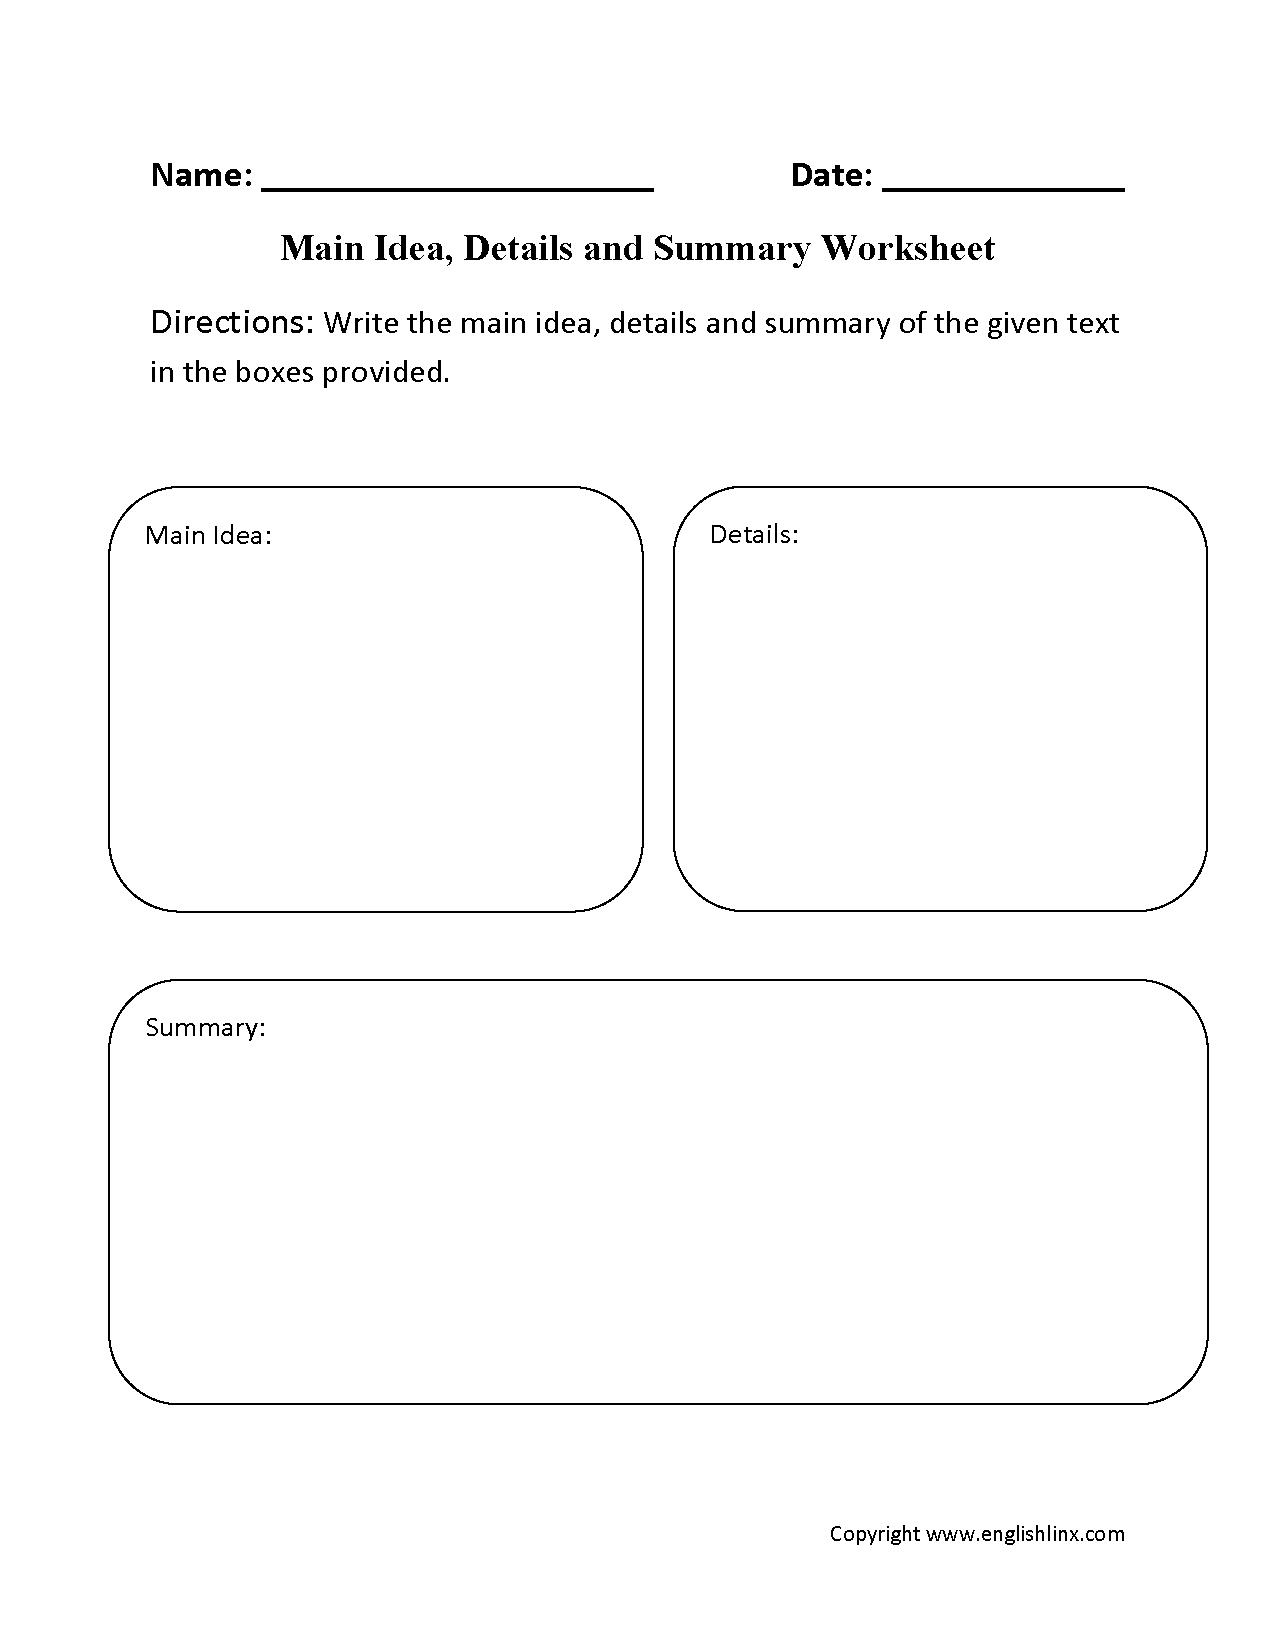 10 Beautiful Main Idea Worksheets 7Th Grade main idea details and summary worksheet education language arts 2021